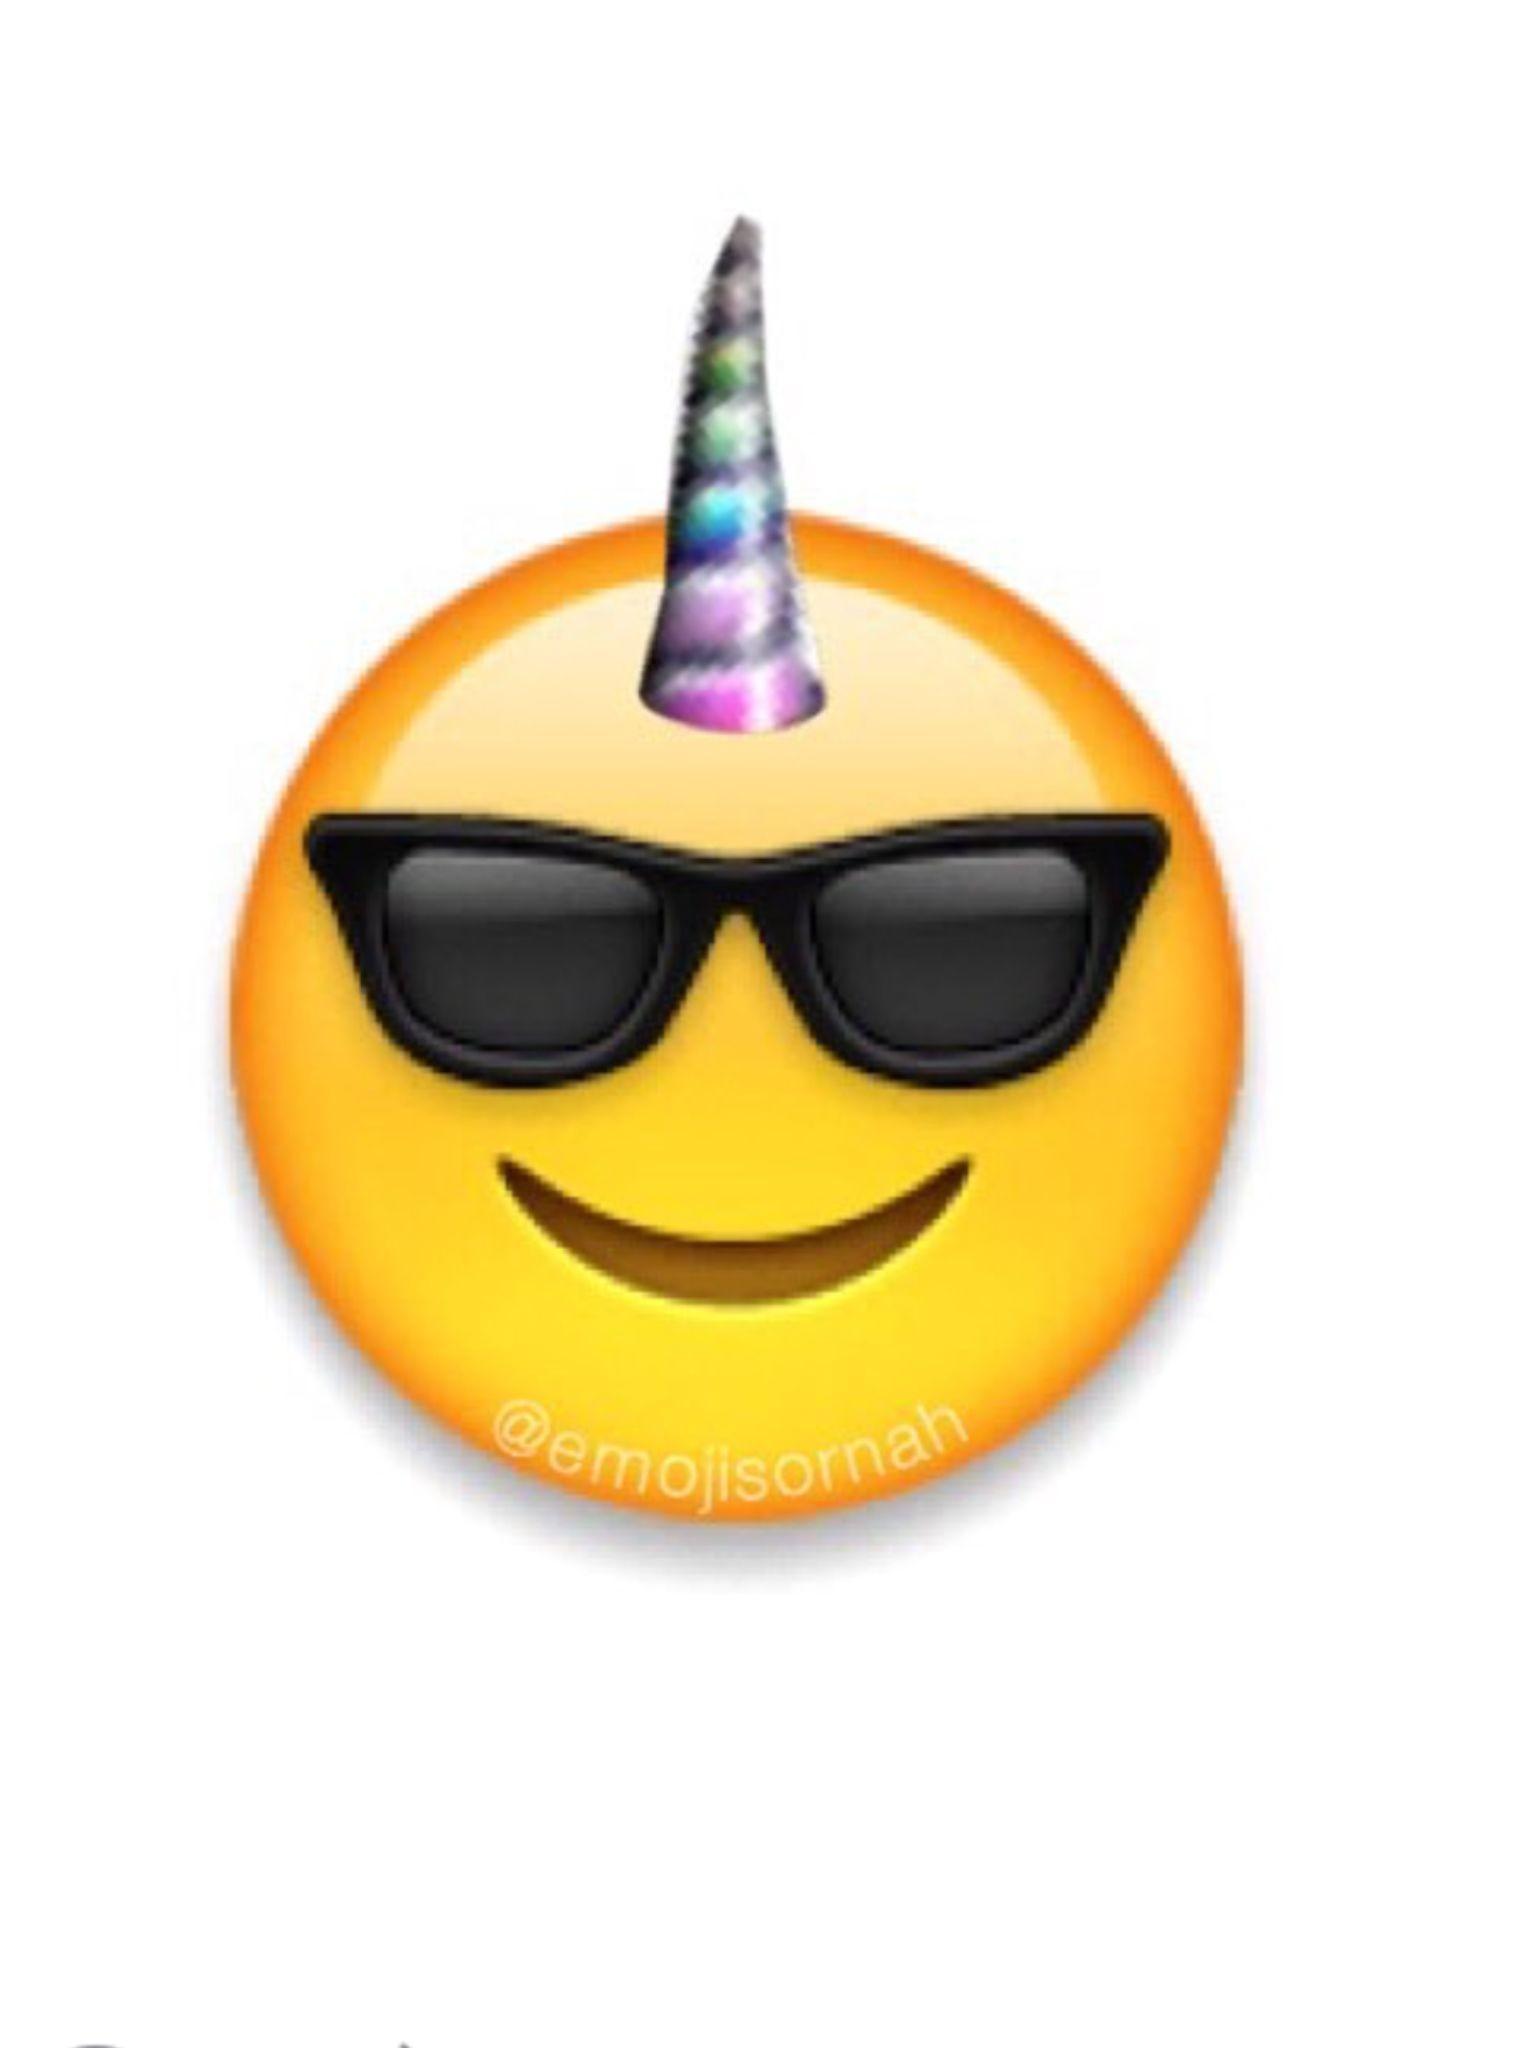 1536x2048 Cool Unicorn Emoji Lol Data Id 144971 Cool Unicorn Emoji 1536x2048 Wallpaper Teahub Io